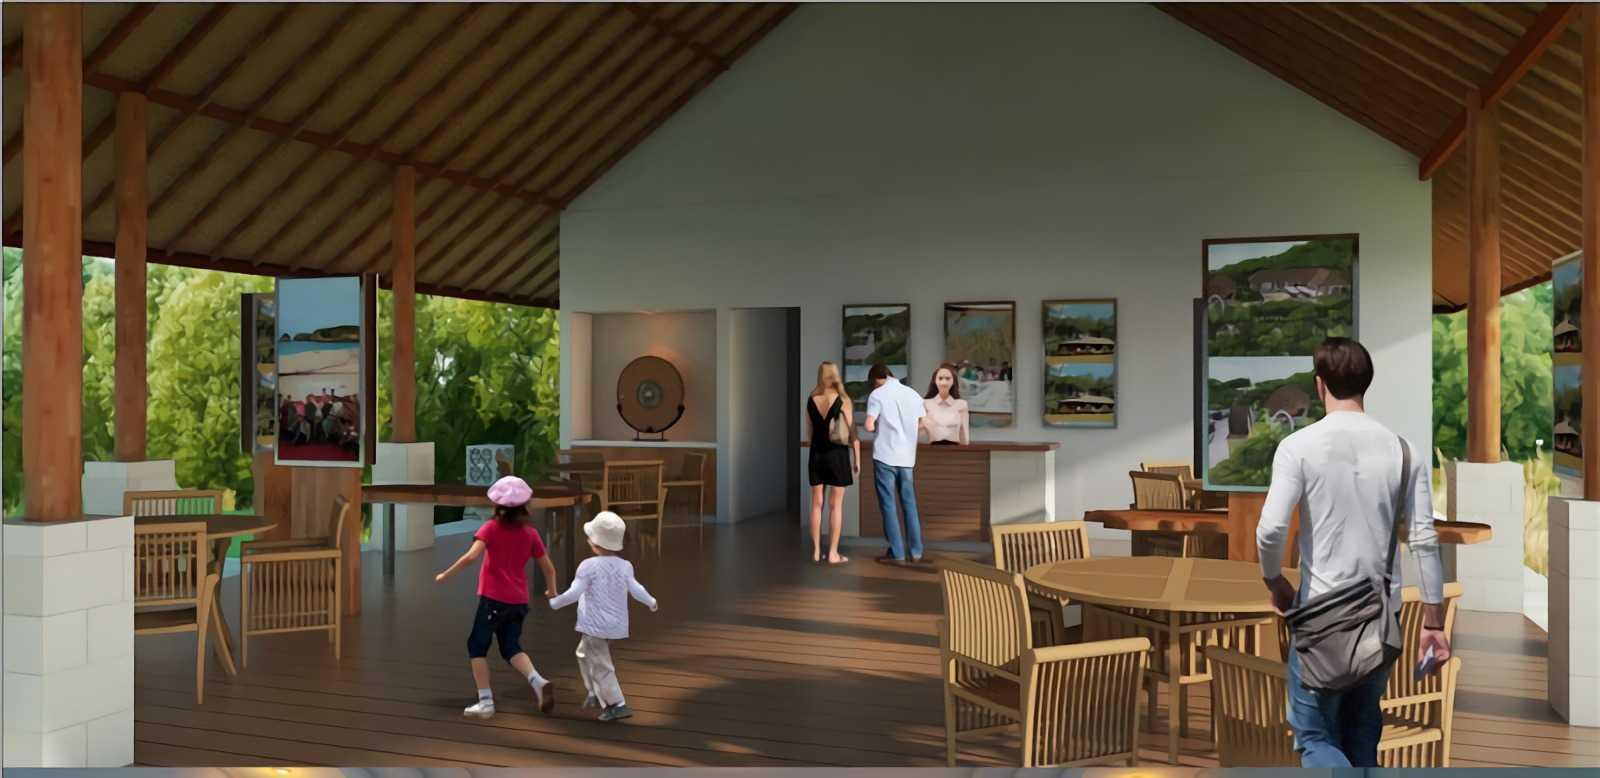 Hg Architects & Designers Associates Taman Wisata Alam Gunung Tunak Lombok, Ntb Lombok, Ntb Seating Area   24348